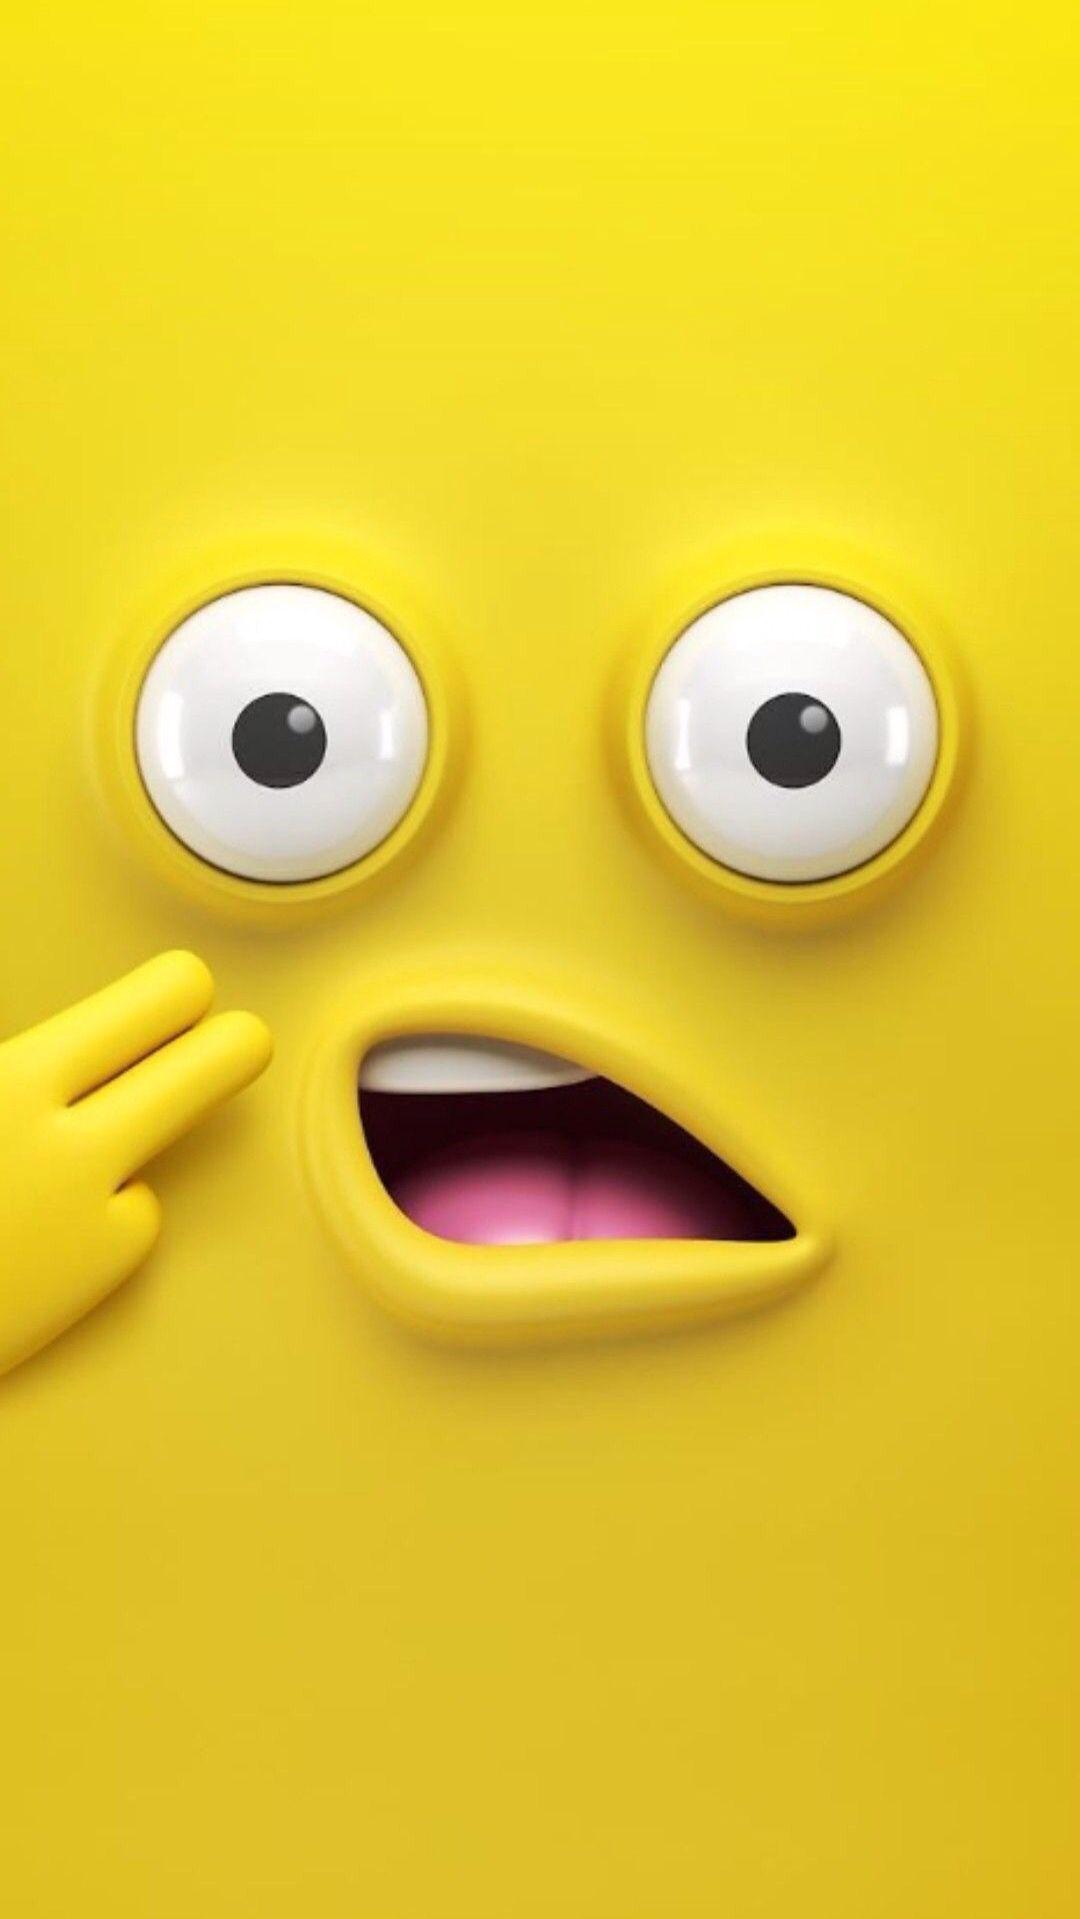 Pin on Funny Sad Faces